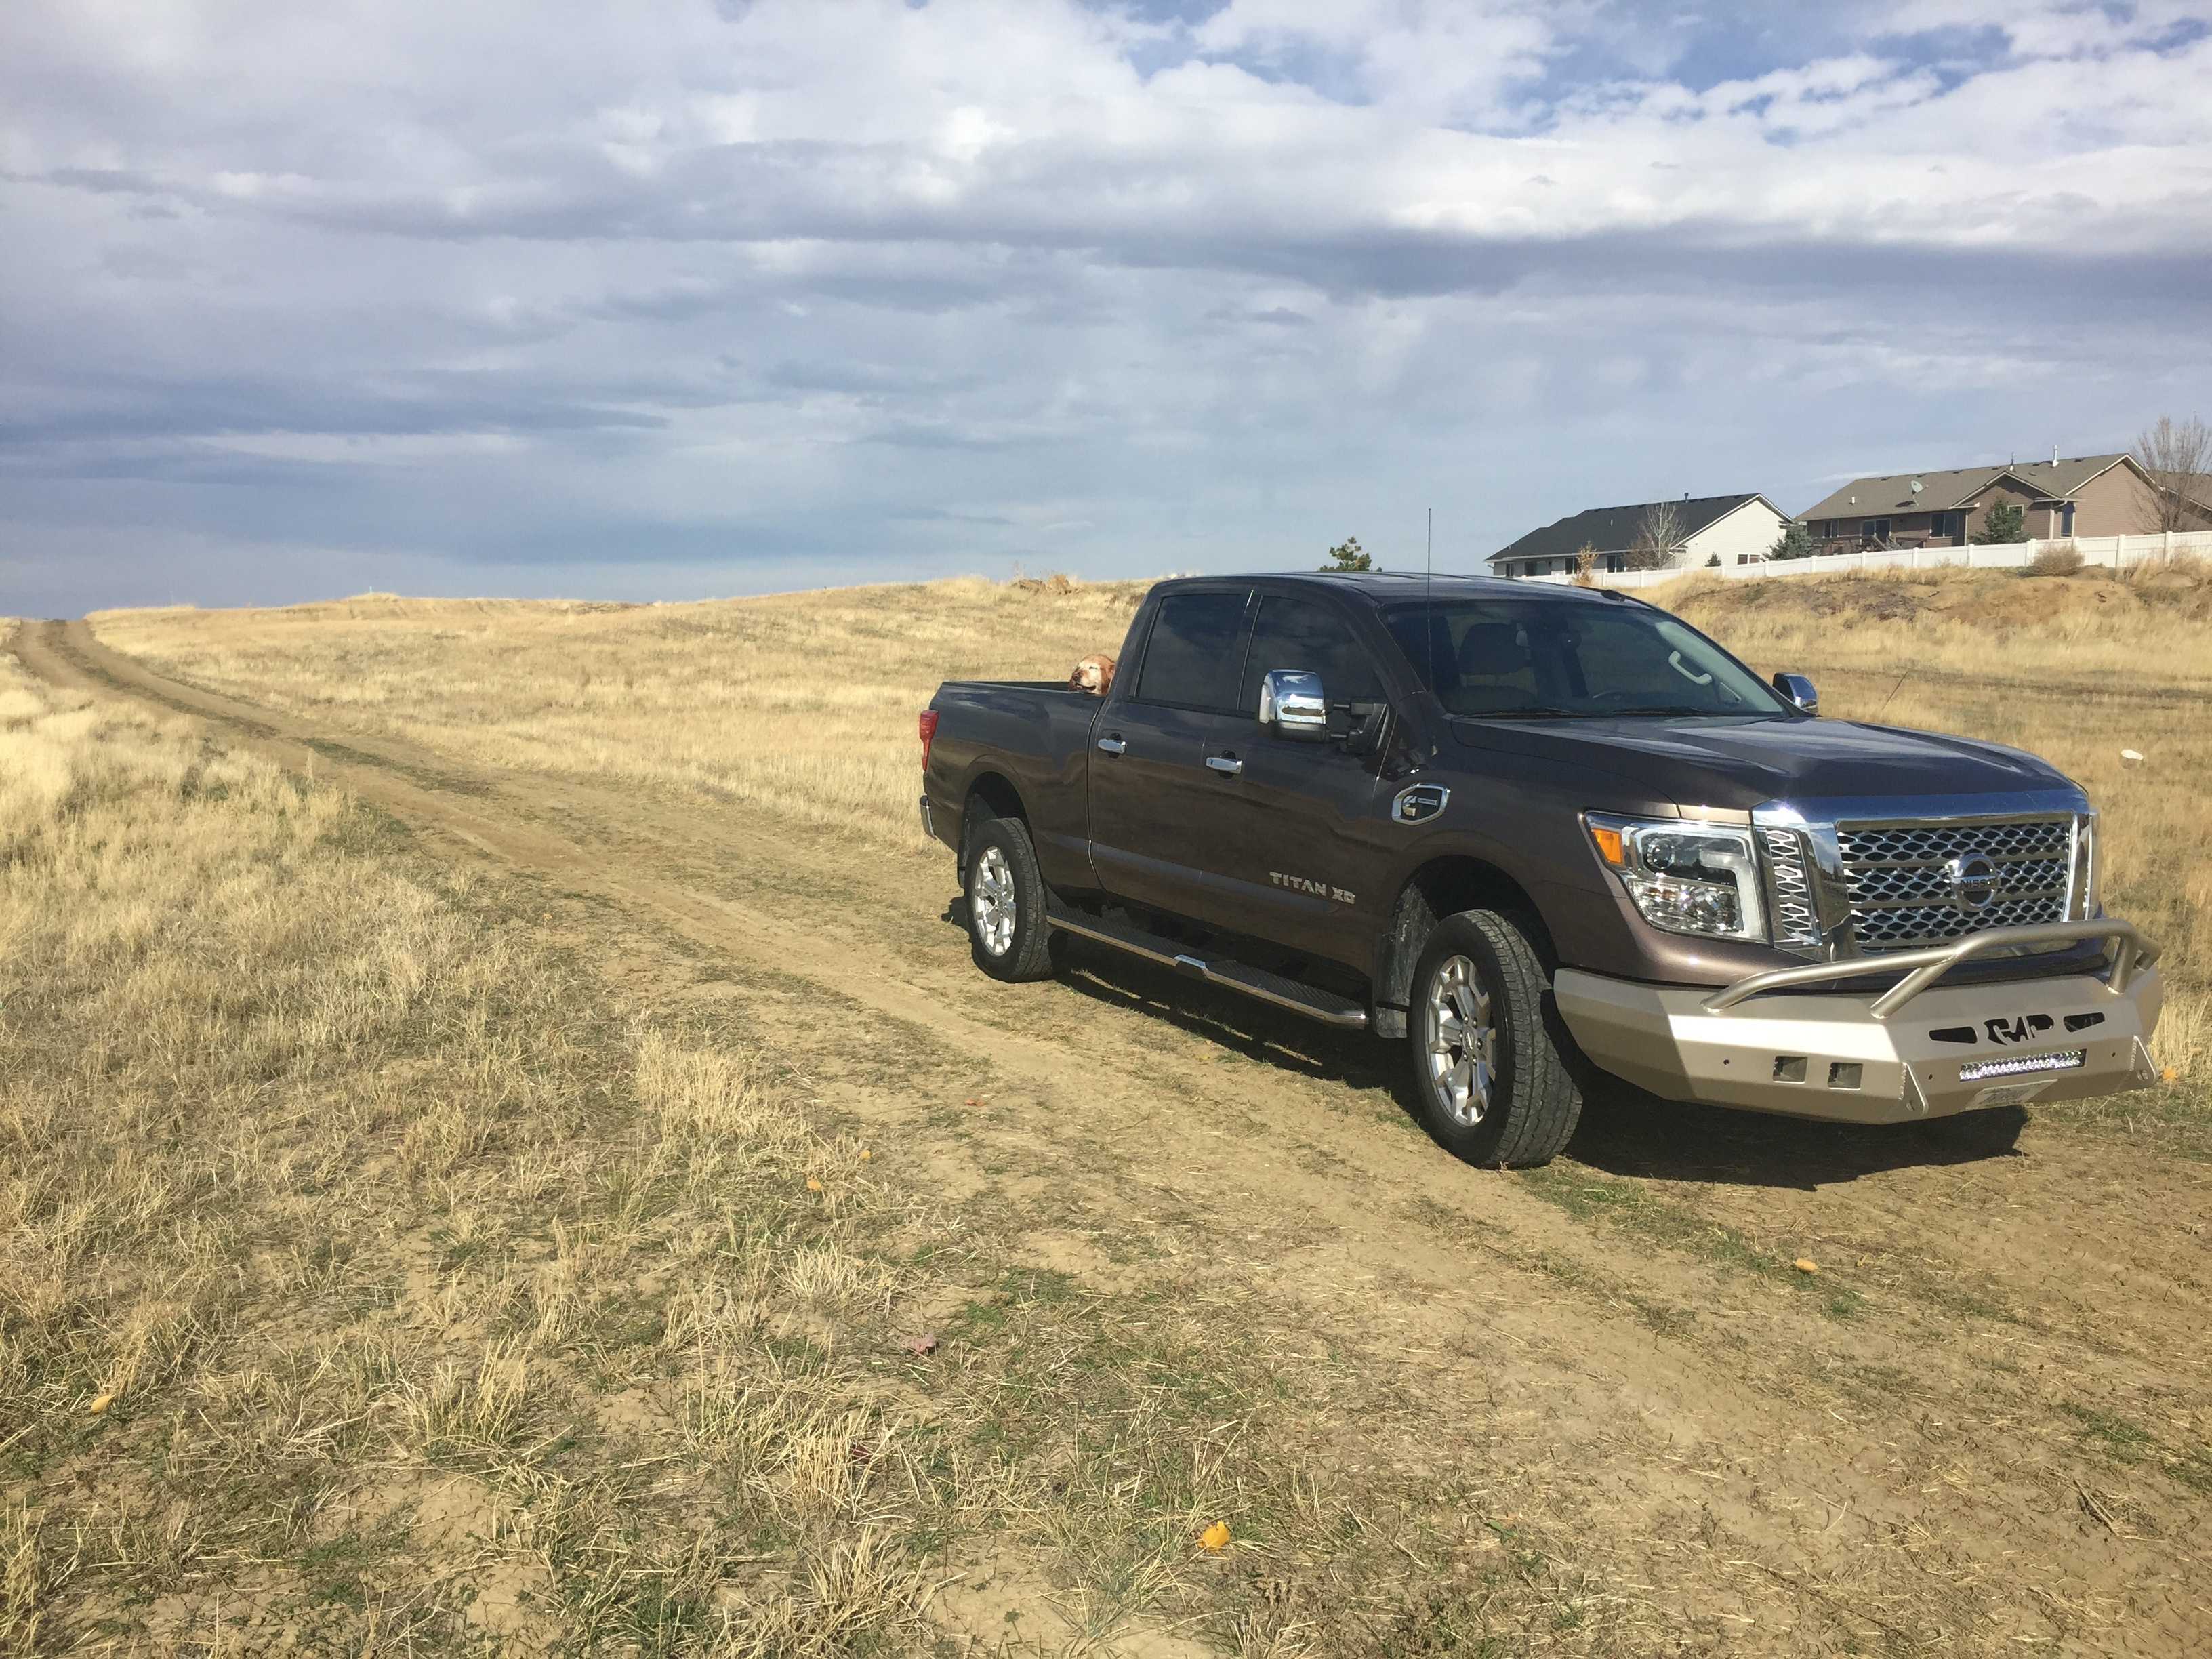 New Titan truck in Billings MT | Ryan Mason